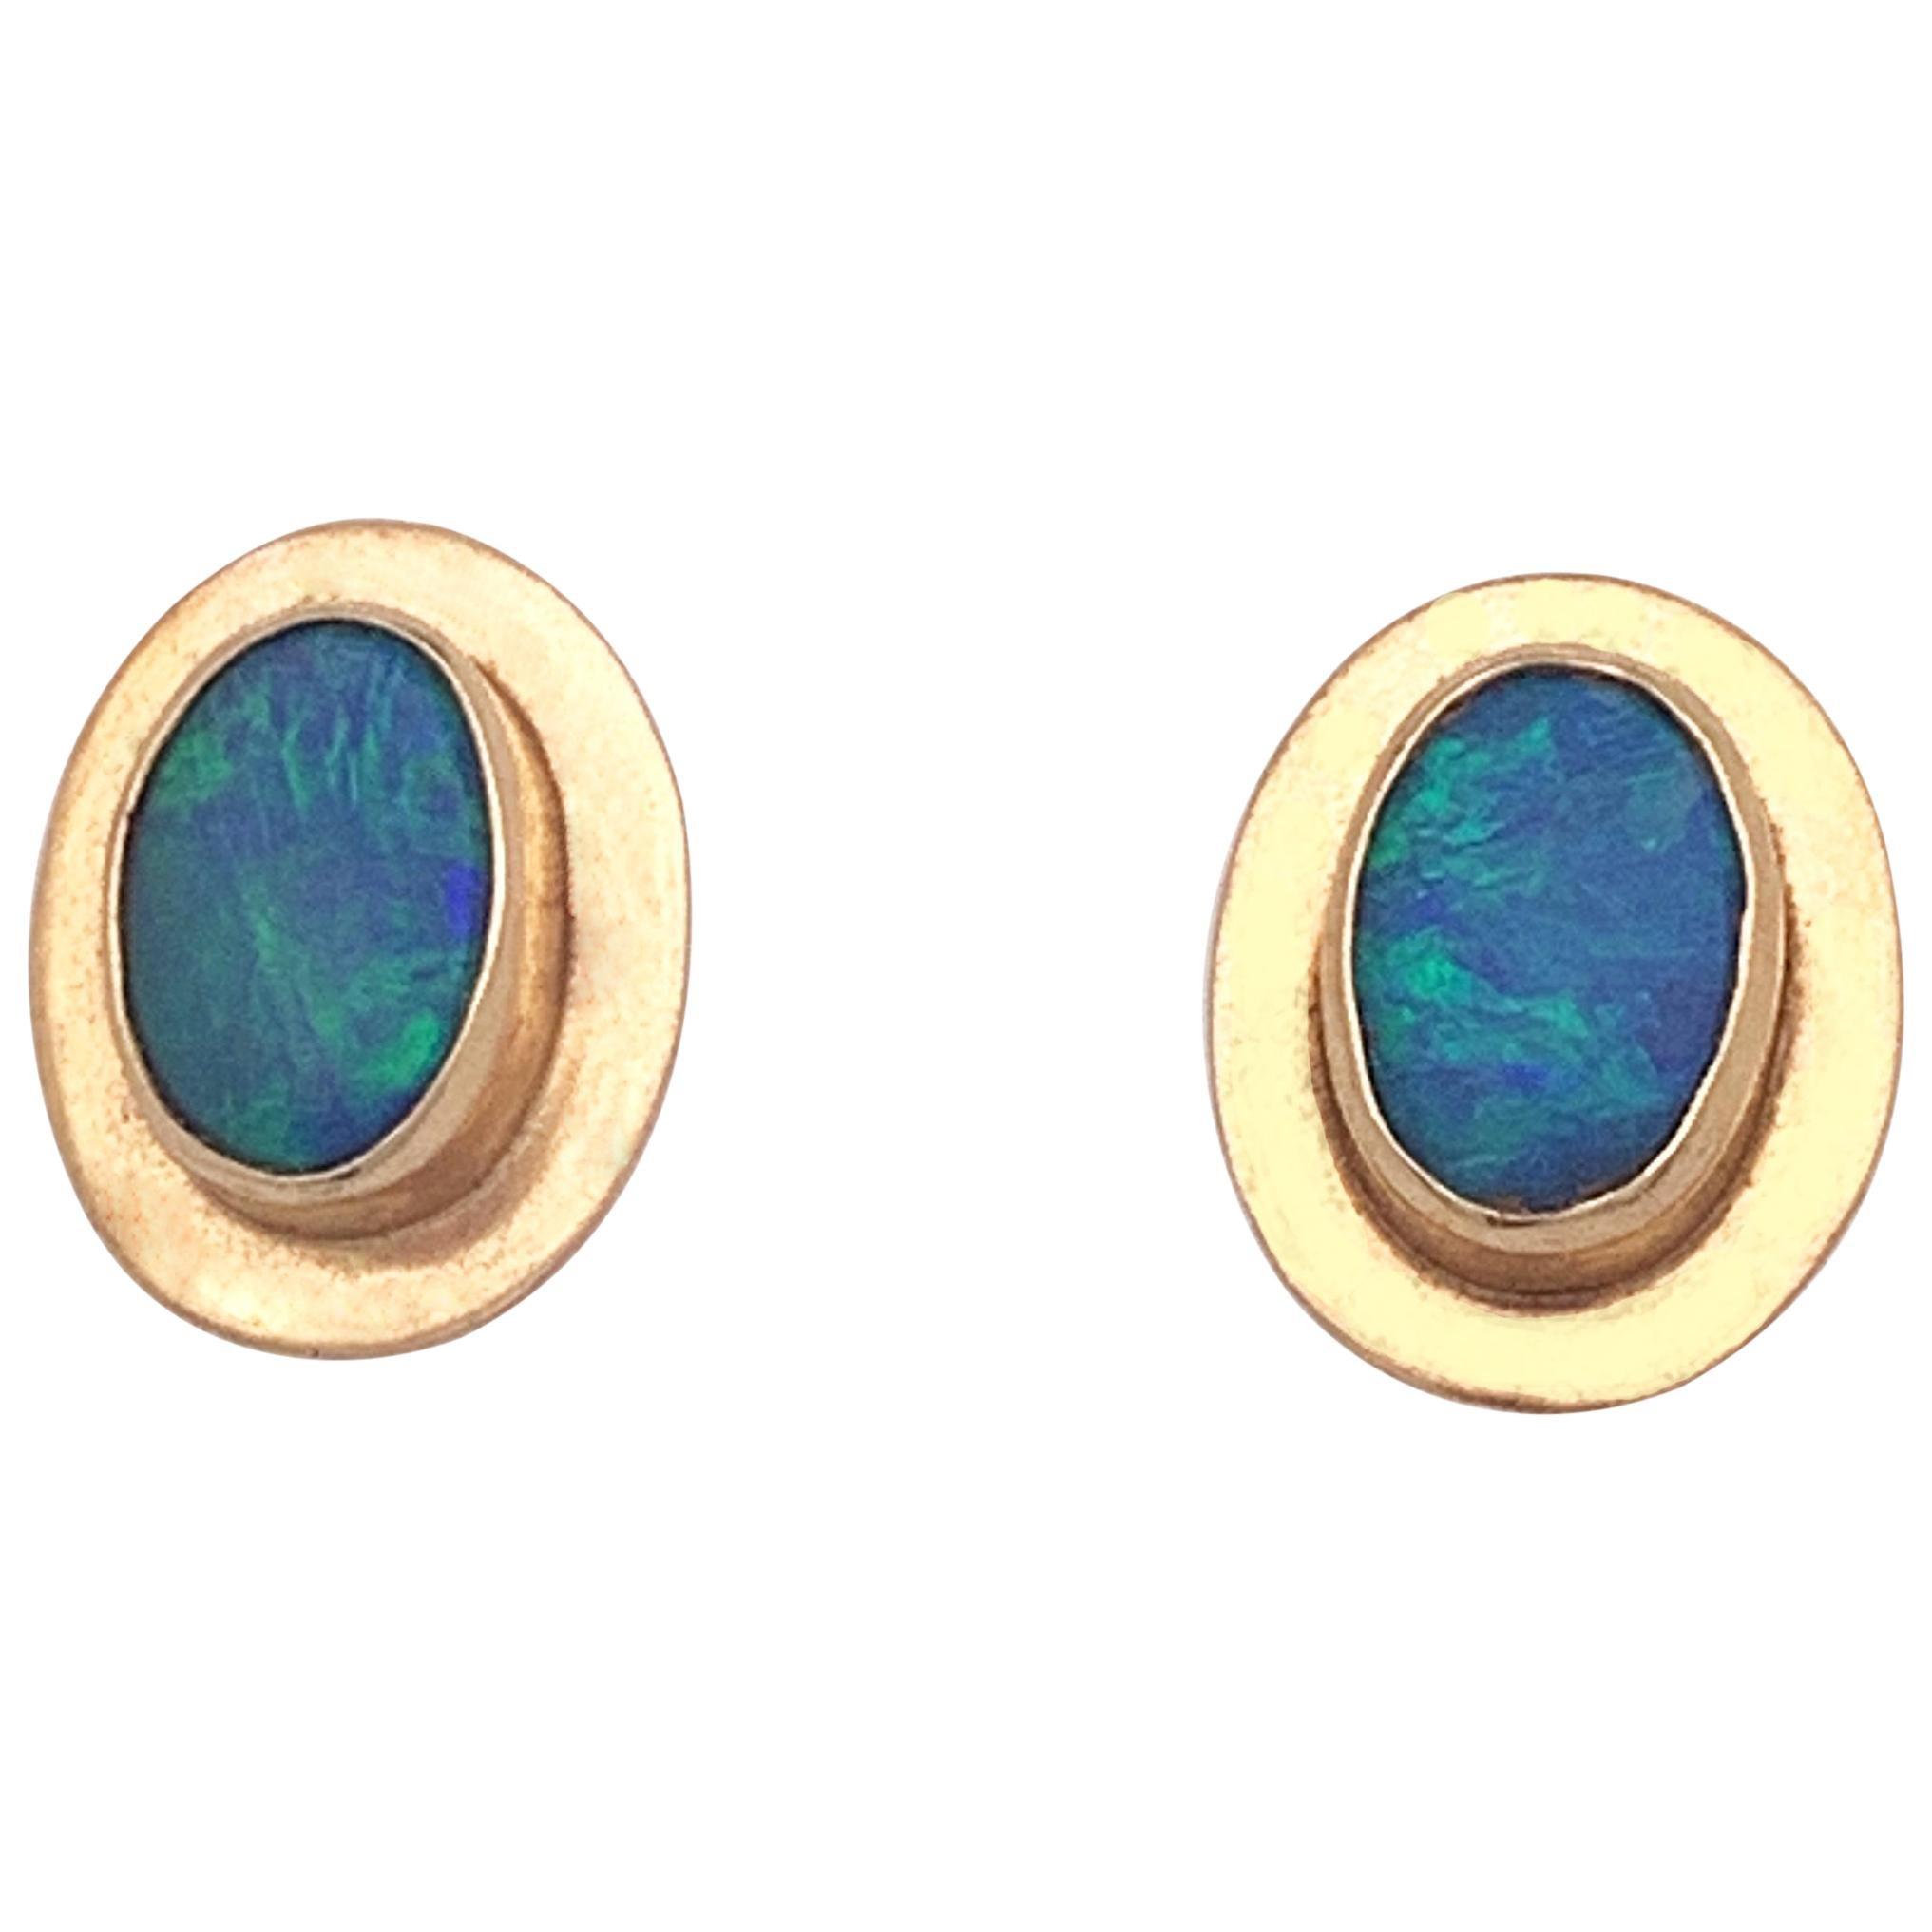 Natural Opal Stud Earrings Encased in 14 Karat Yellow Gold Bezels